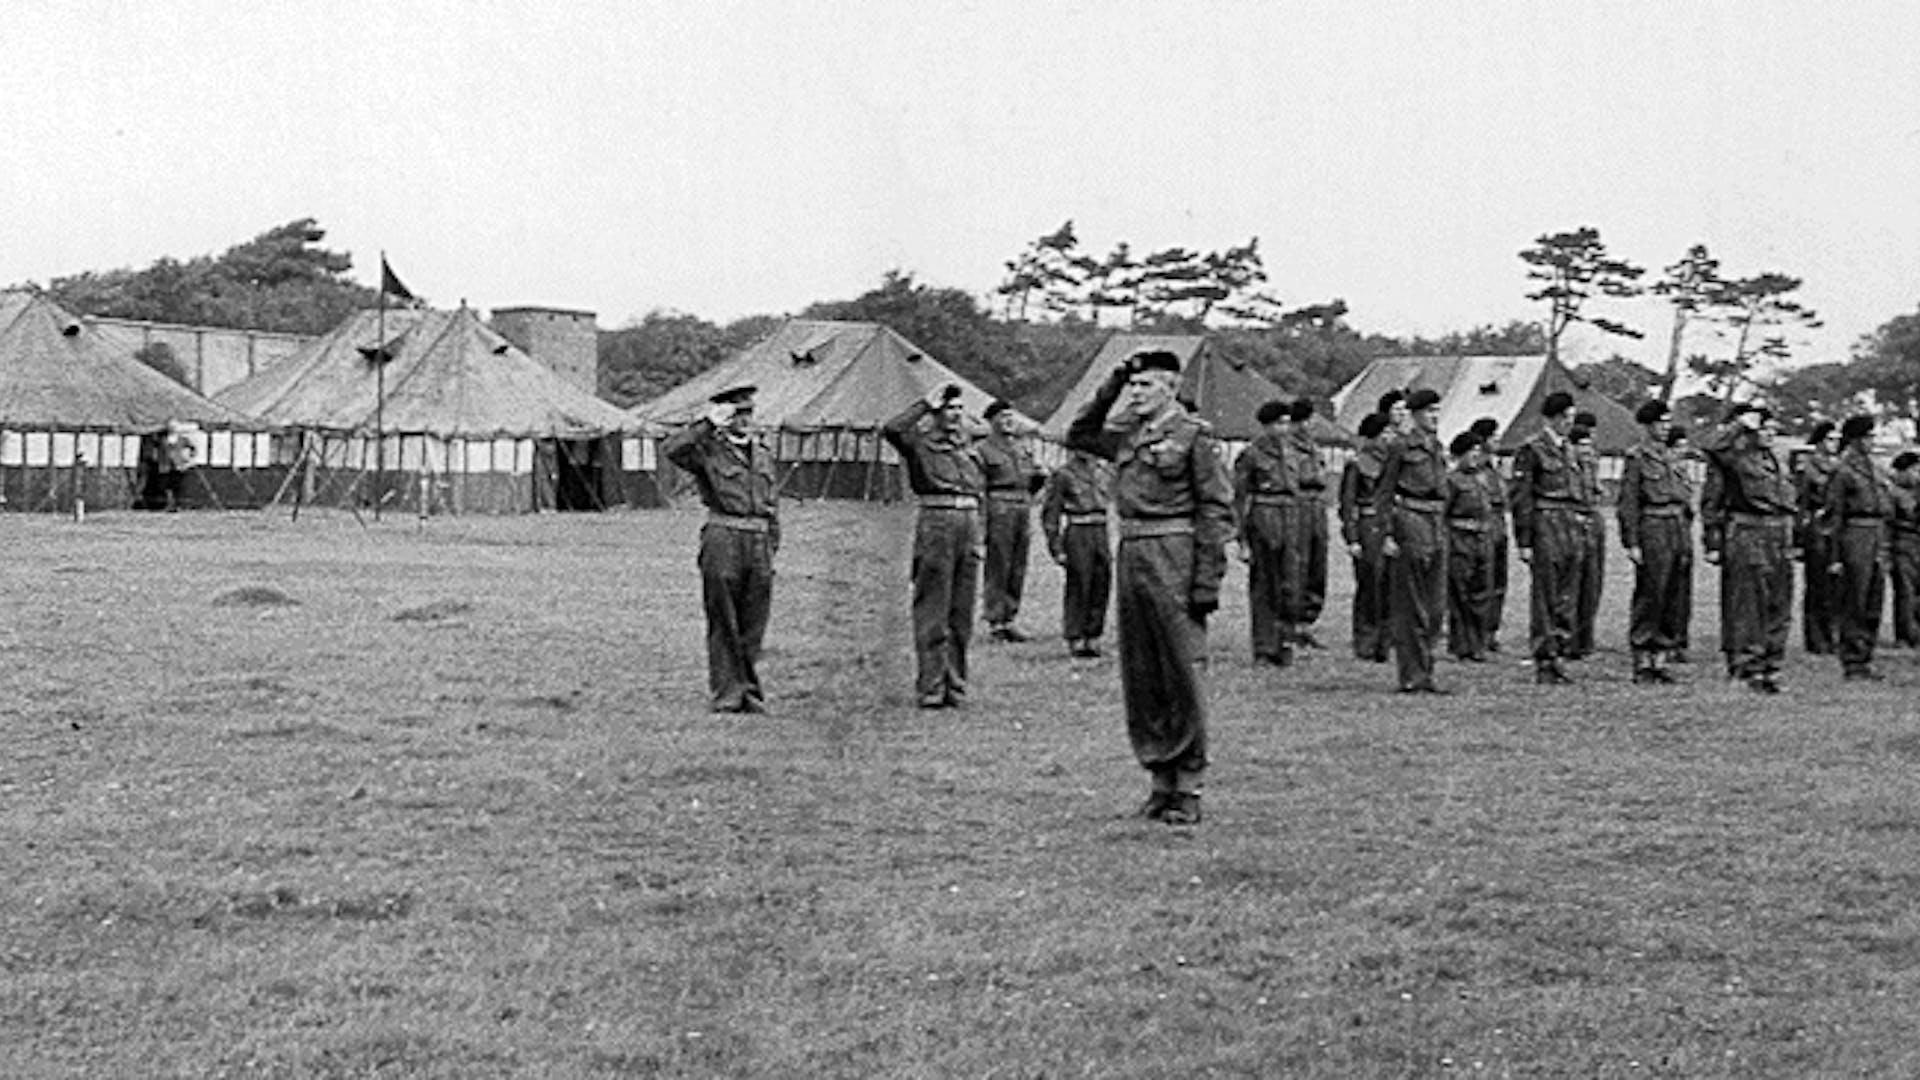 04 19540810 Parade Annual Camp Cliff End Io W